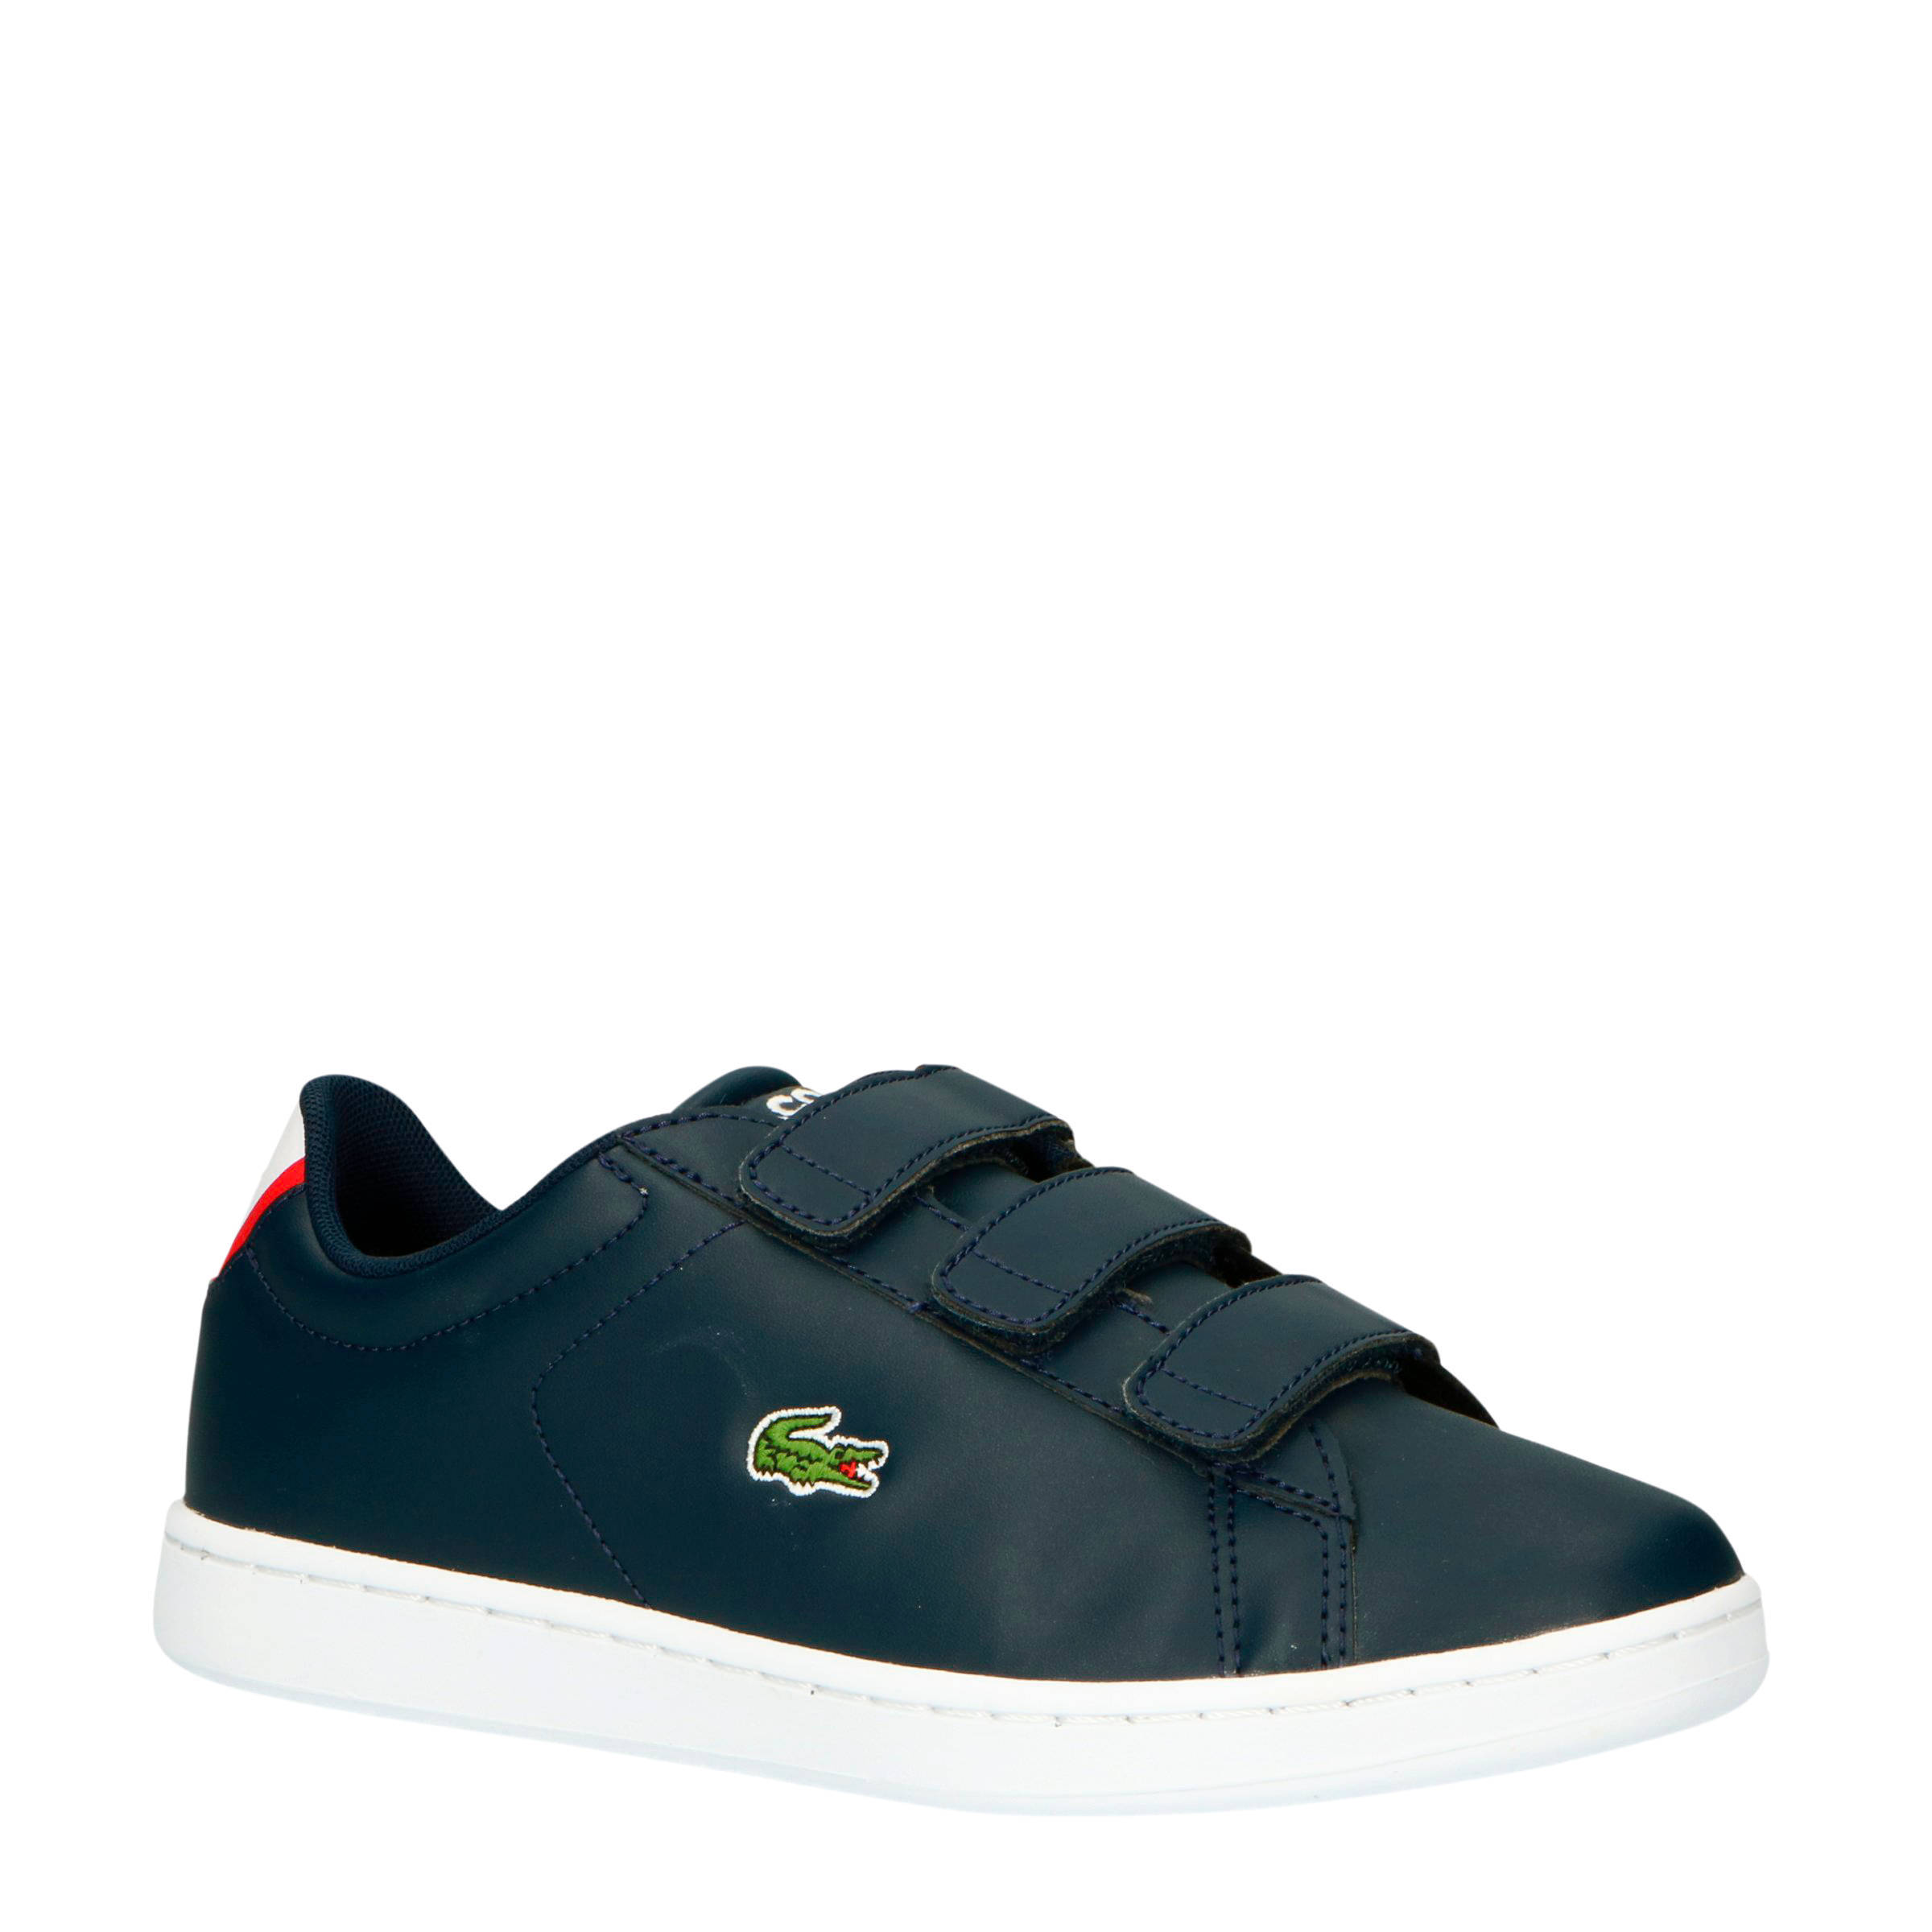 Carnaby Evo 319 sneakers donkerblauwrood